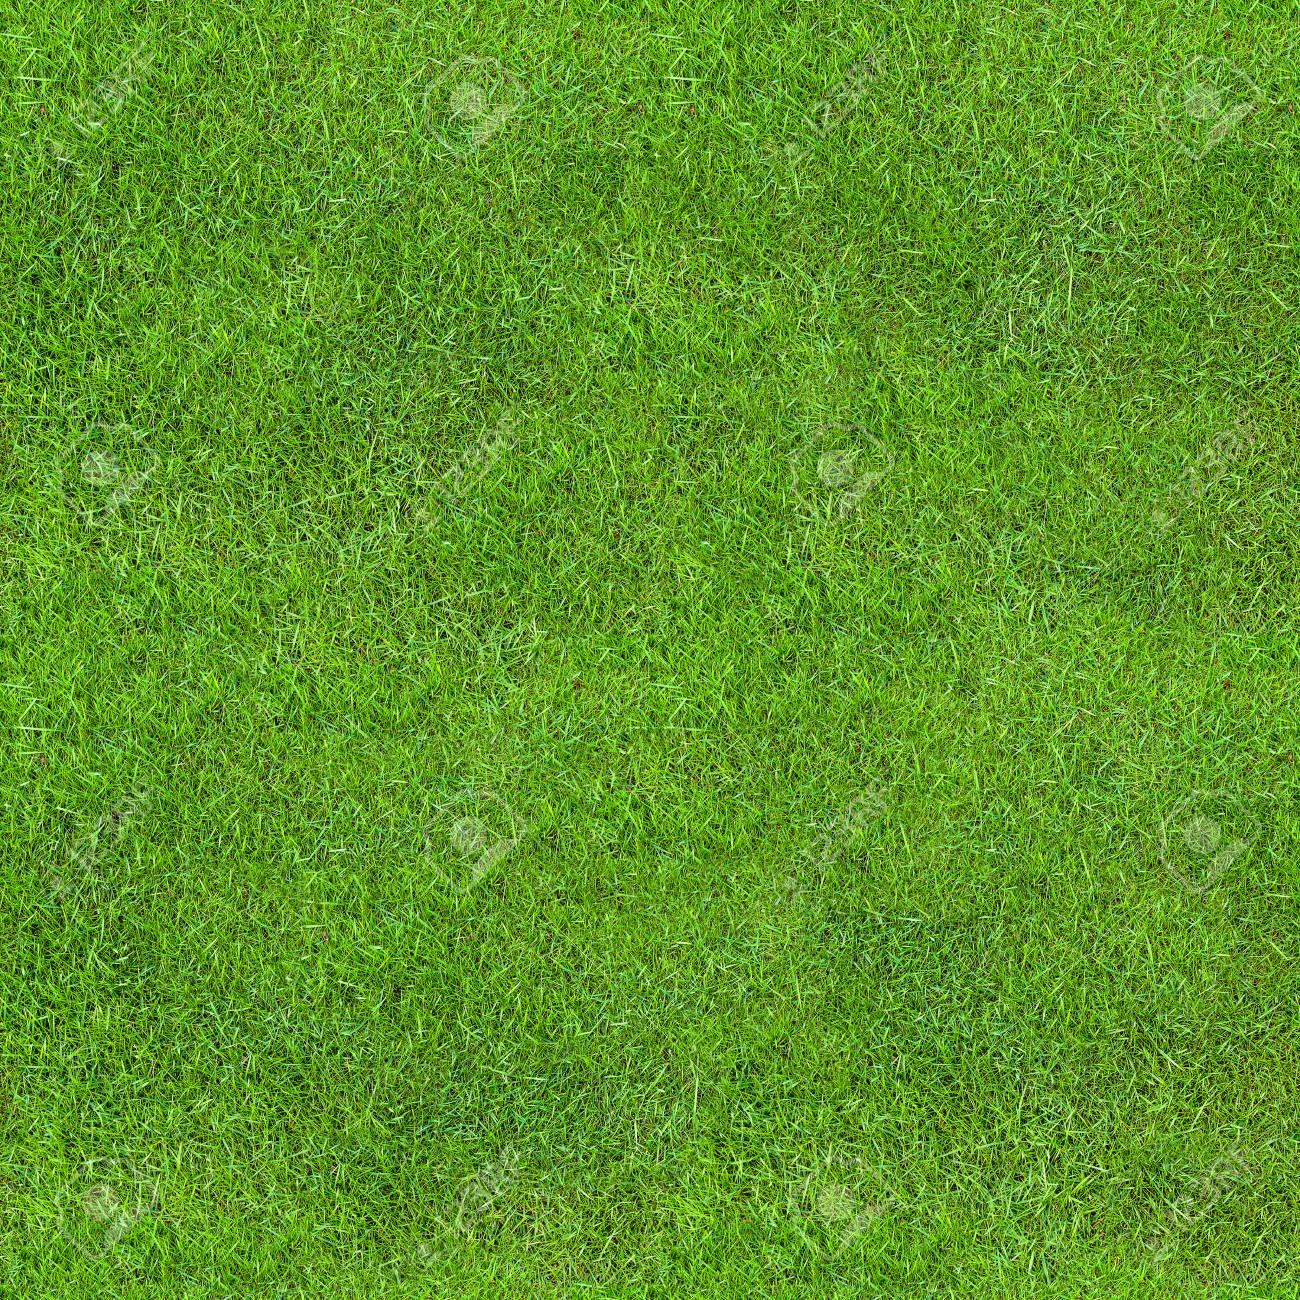 Seamless Green Lush Grass Texture. Fresh Backdrop. - 121023606